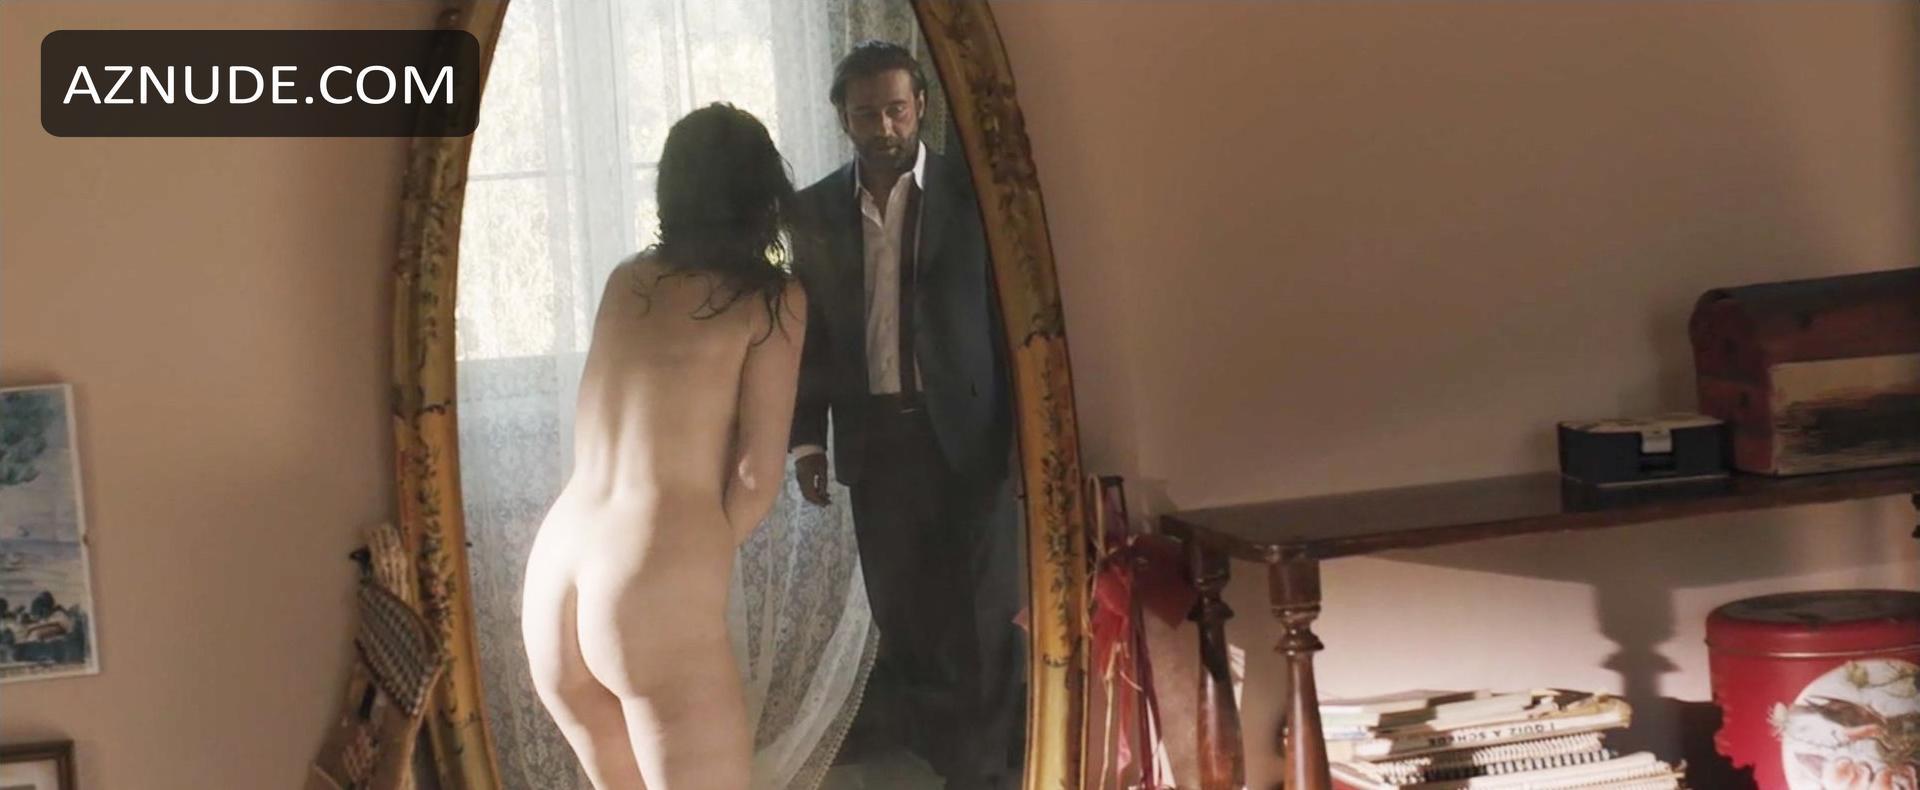 rodriguez pics Veronica nude